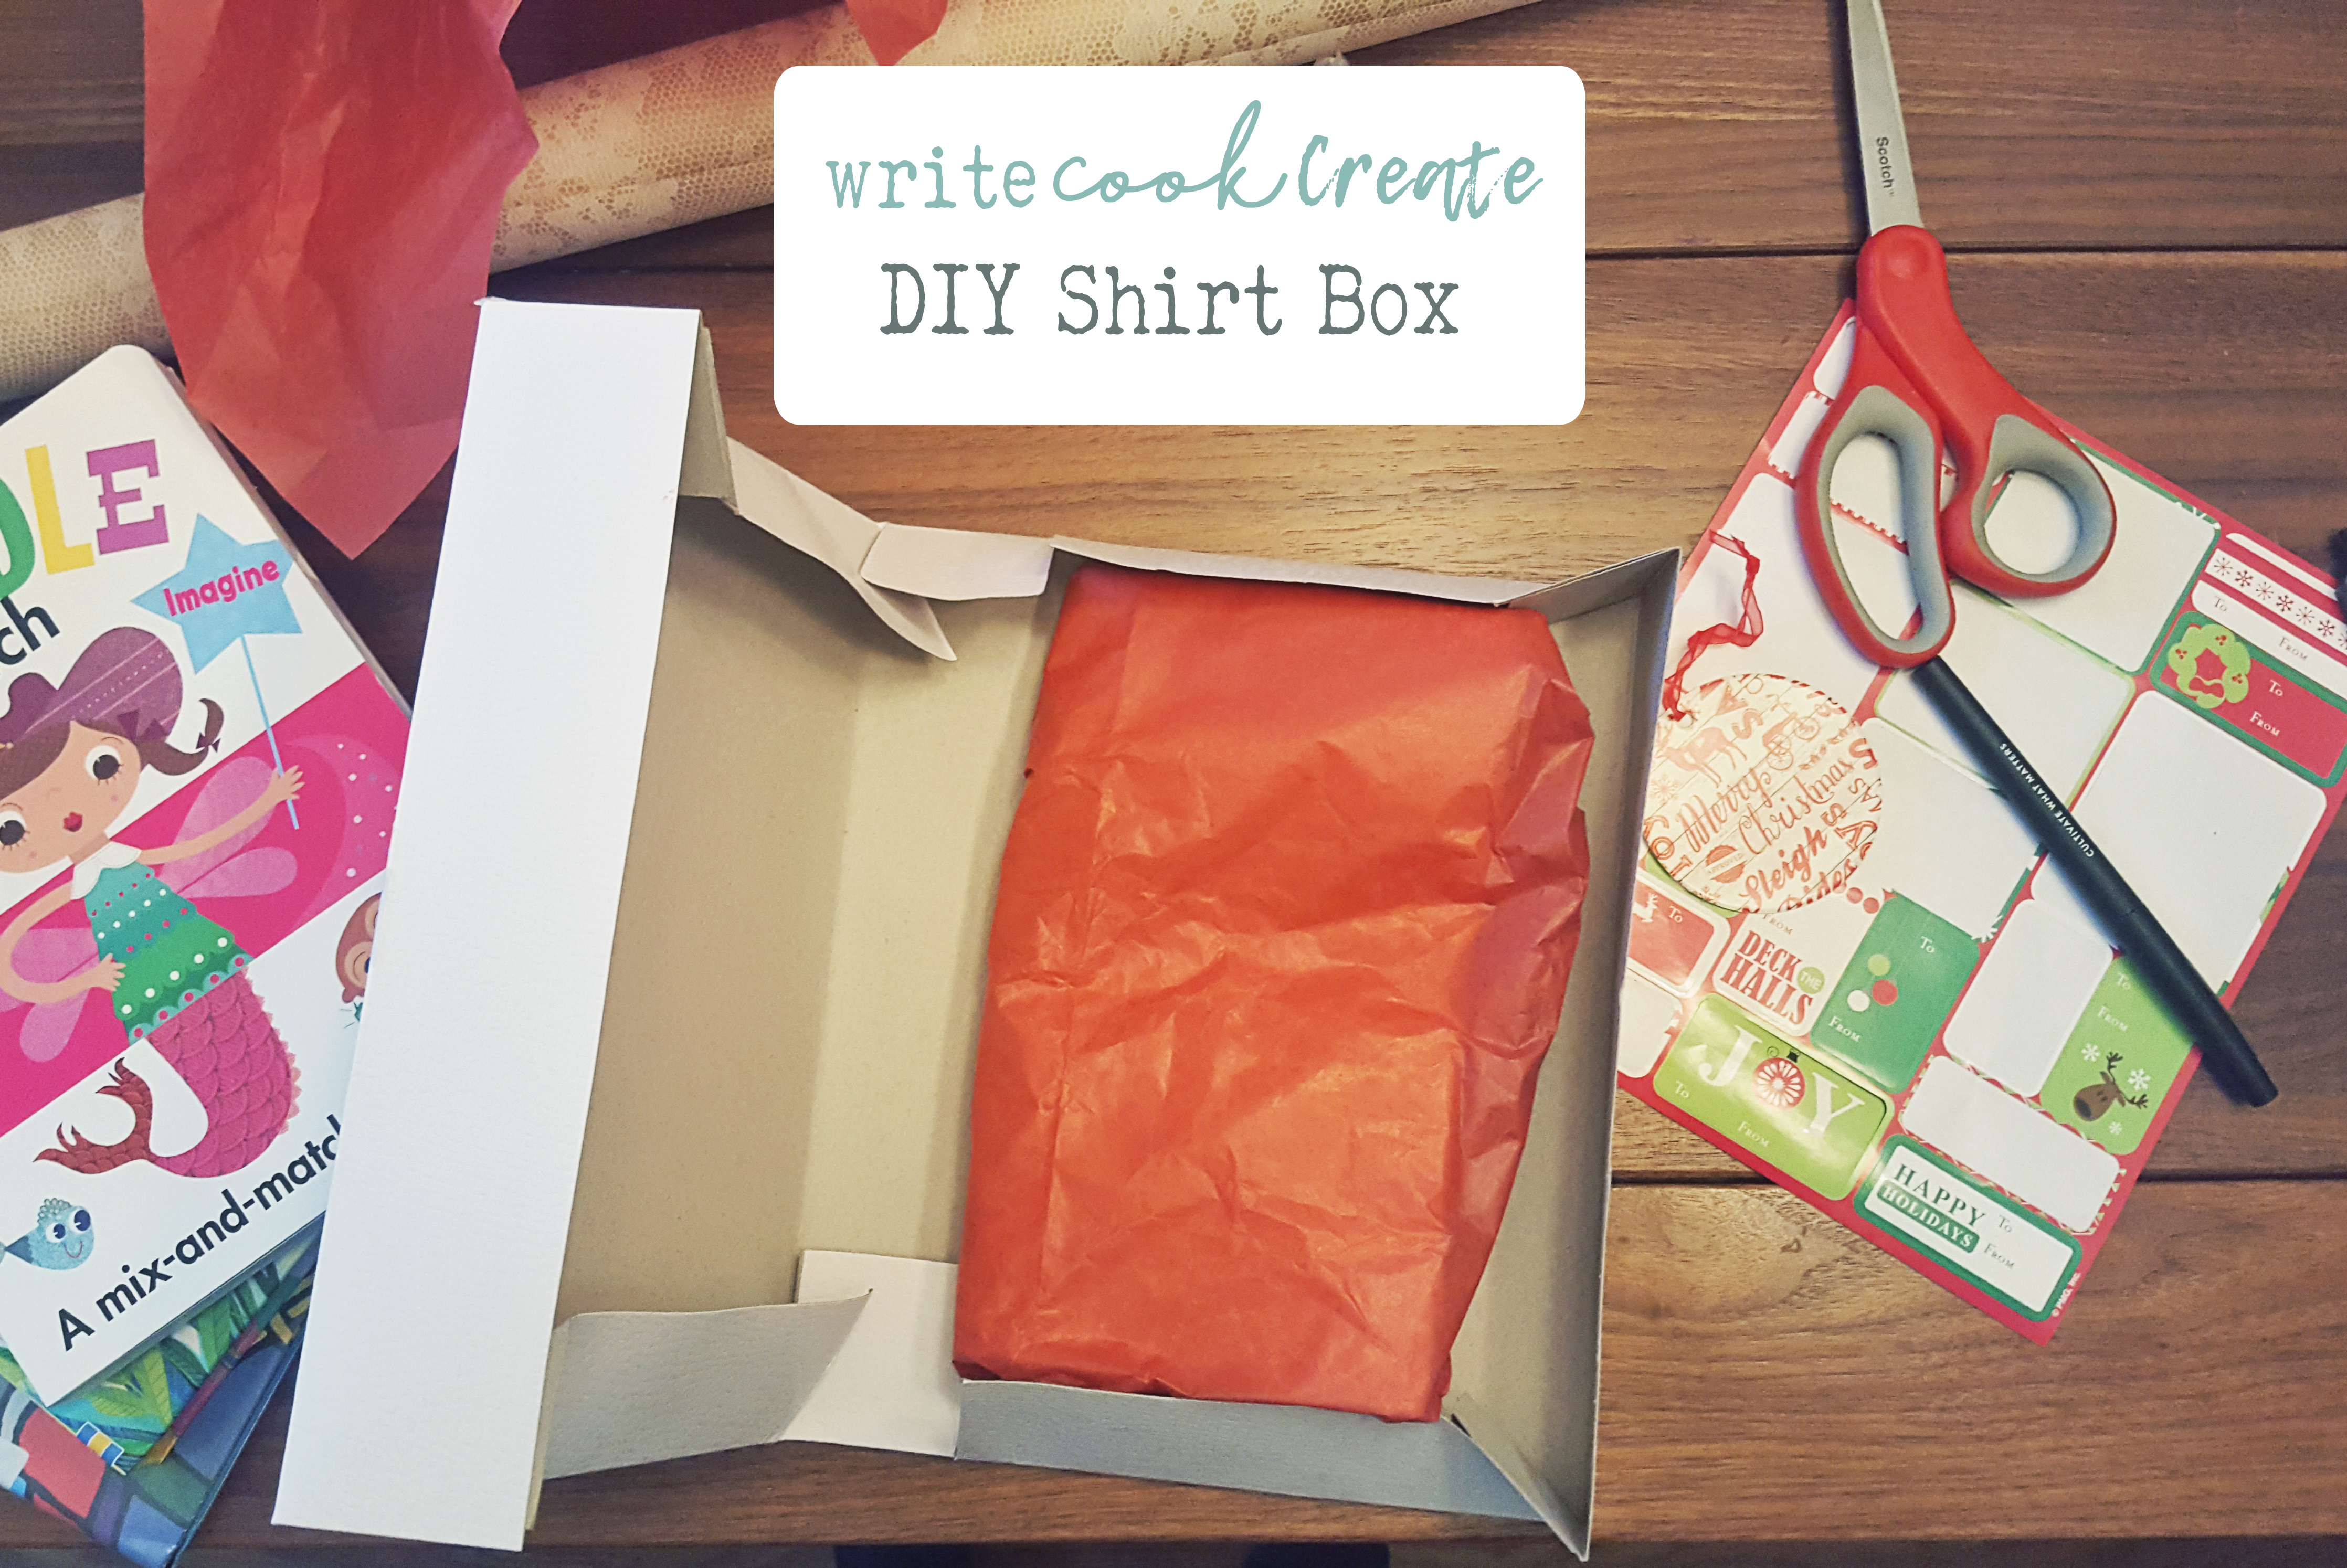 DIY – Create custom box from shirt box